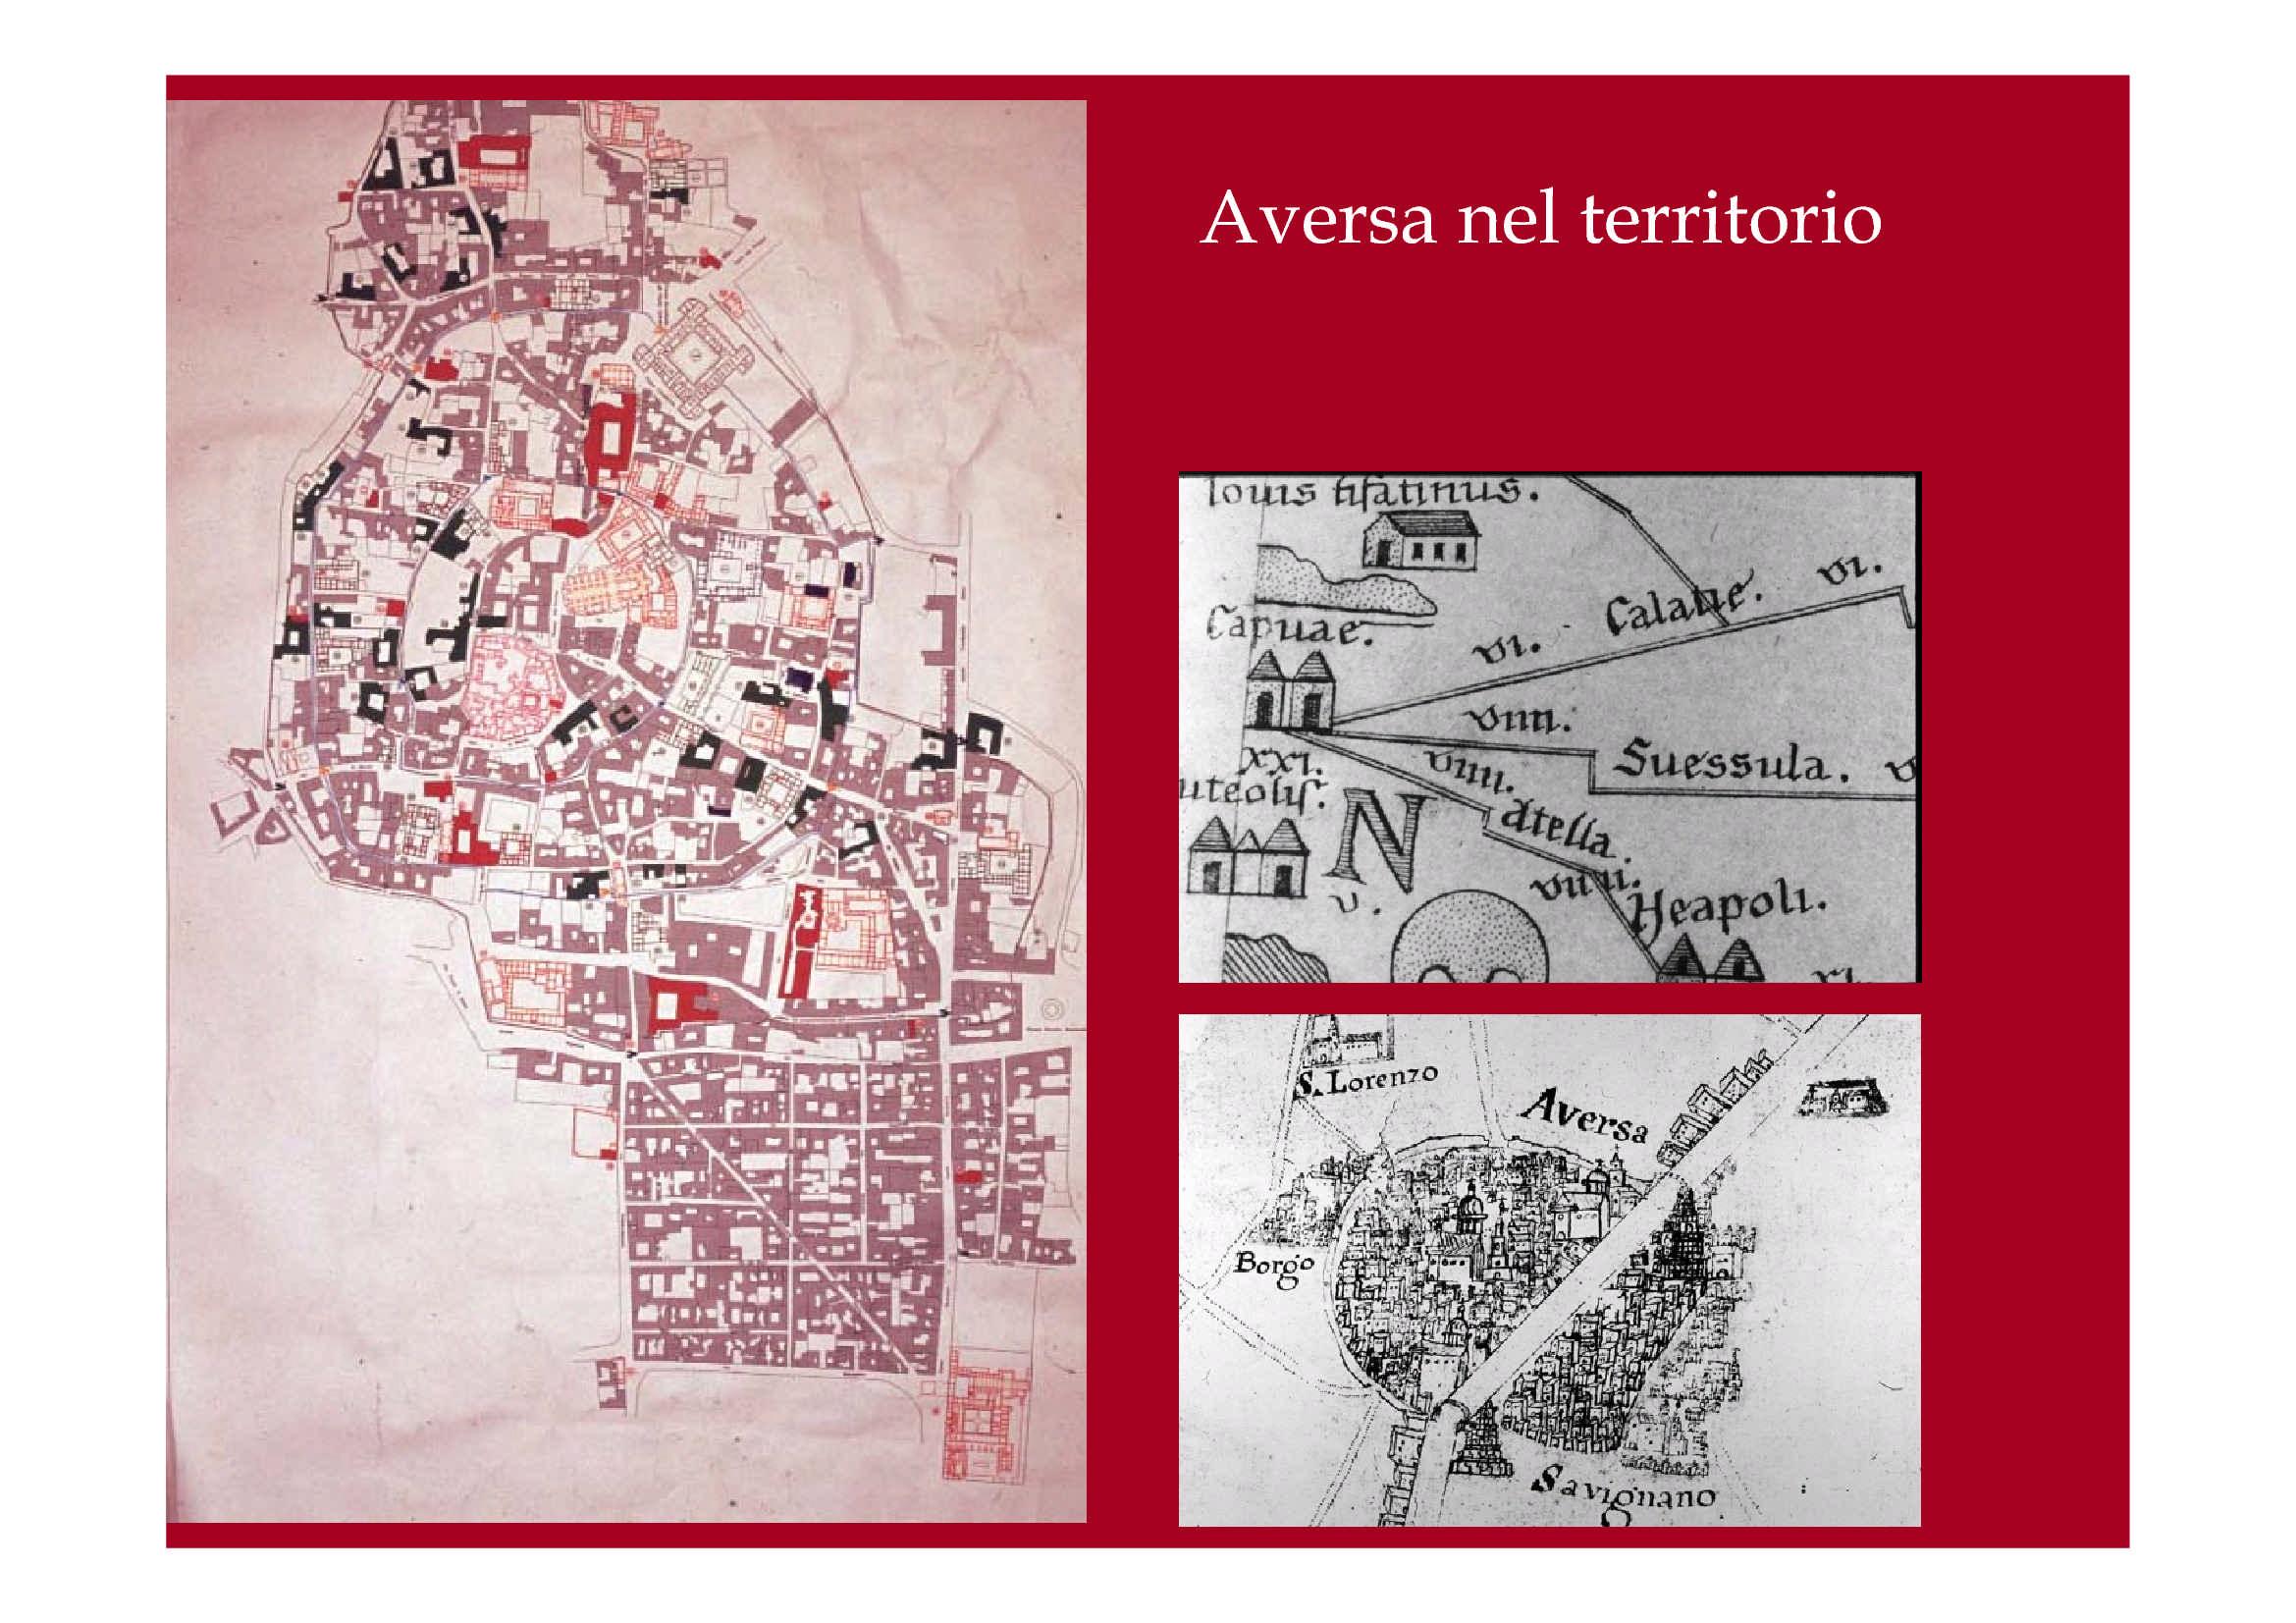 Architettura di Aversa